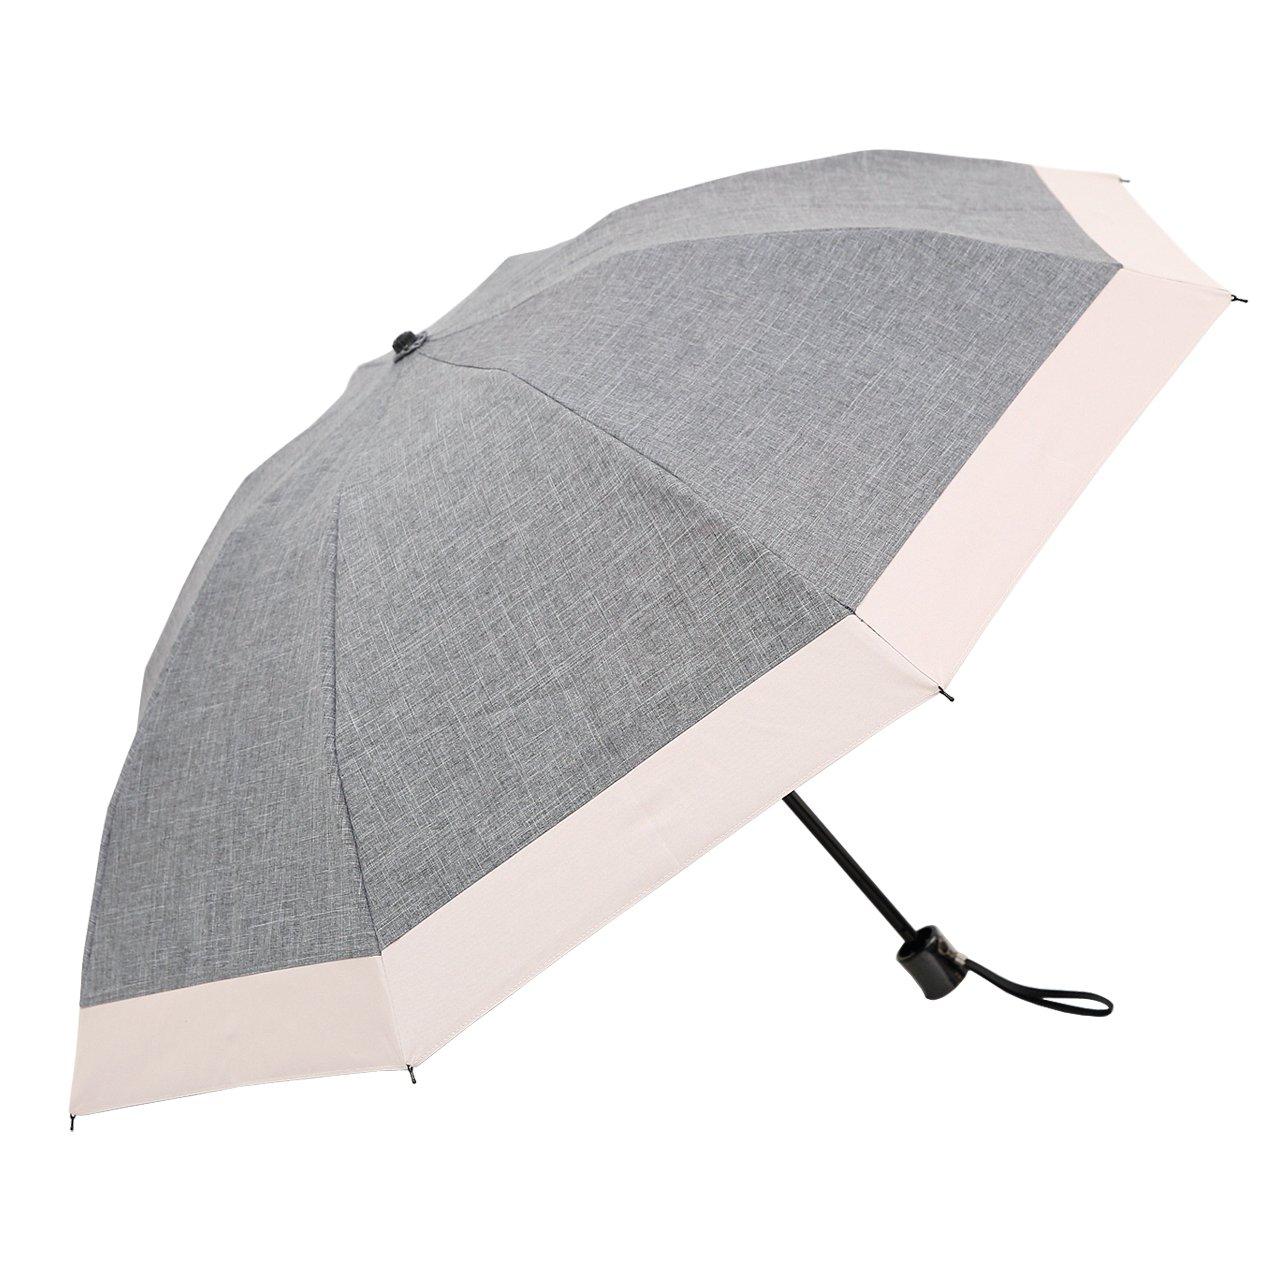 【Rose Blanc】100%完全遮光 日傘 コンビ 3段折りたたみ ダンガリー 50cm 15 (ダンガリーグレー×ピンク) B01427Y4DUダンガリーグレー×ピンク